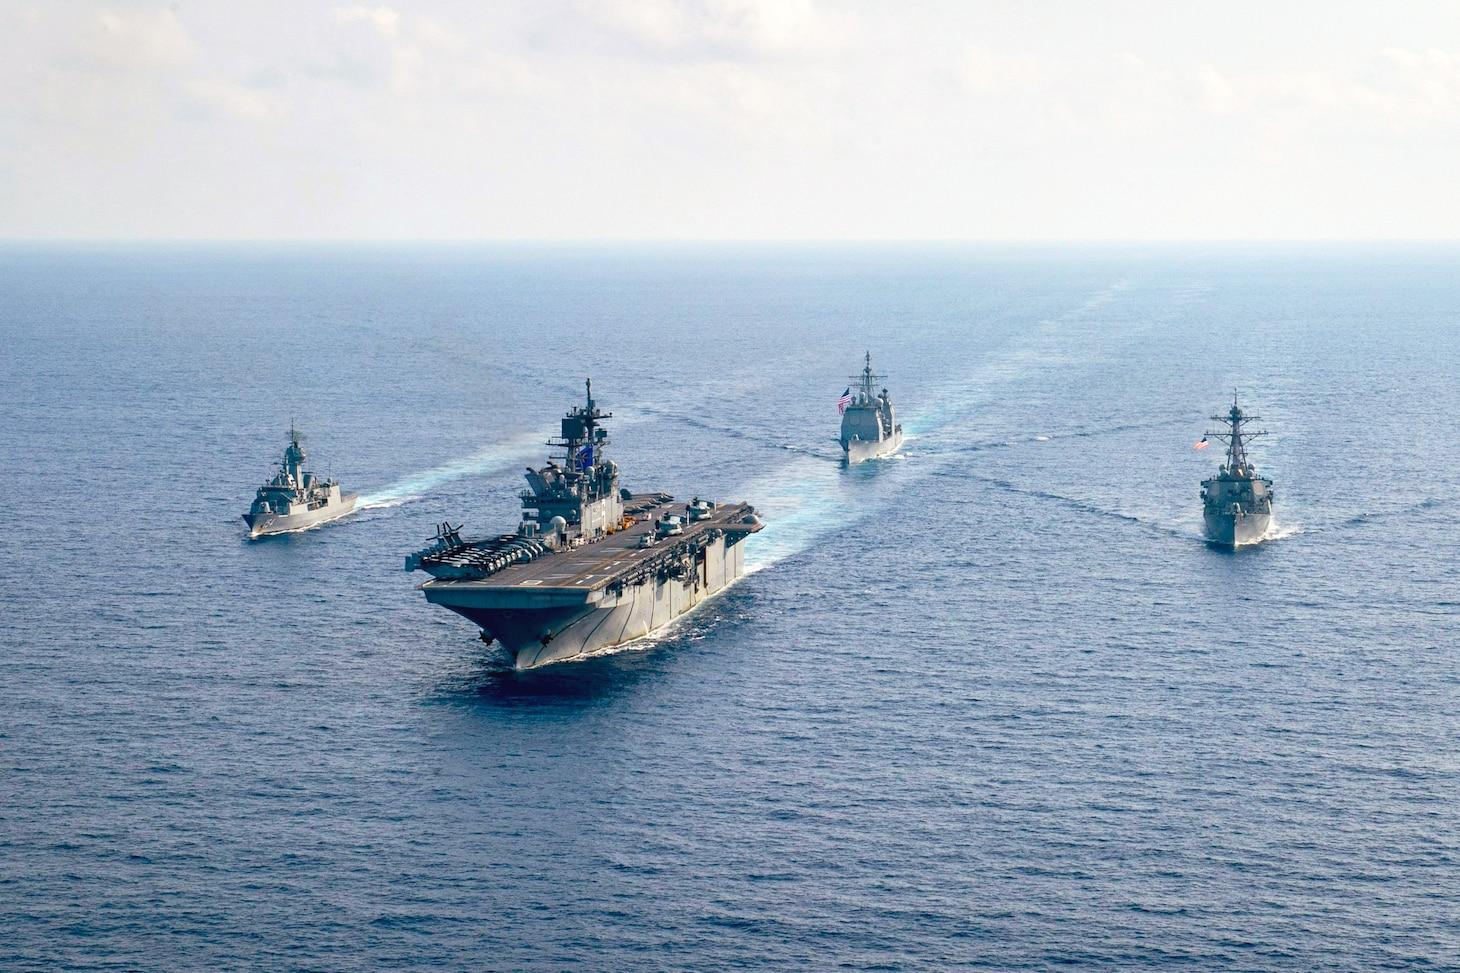 Four ships steam alongside each other on the ocean.